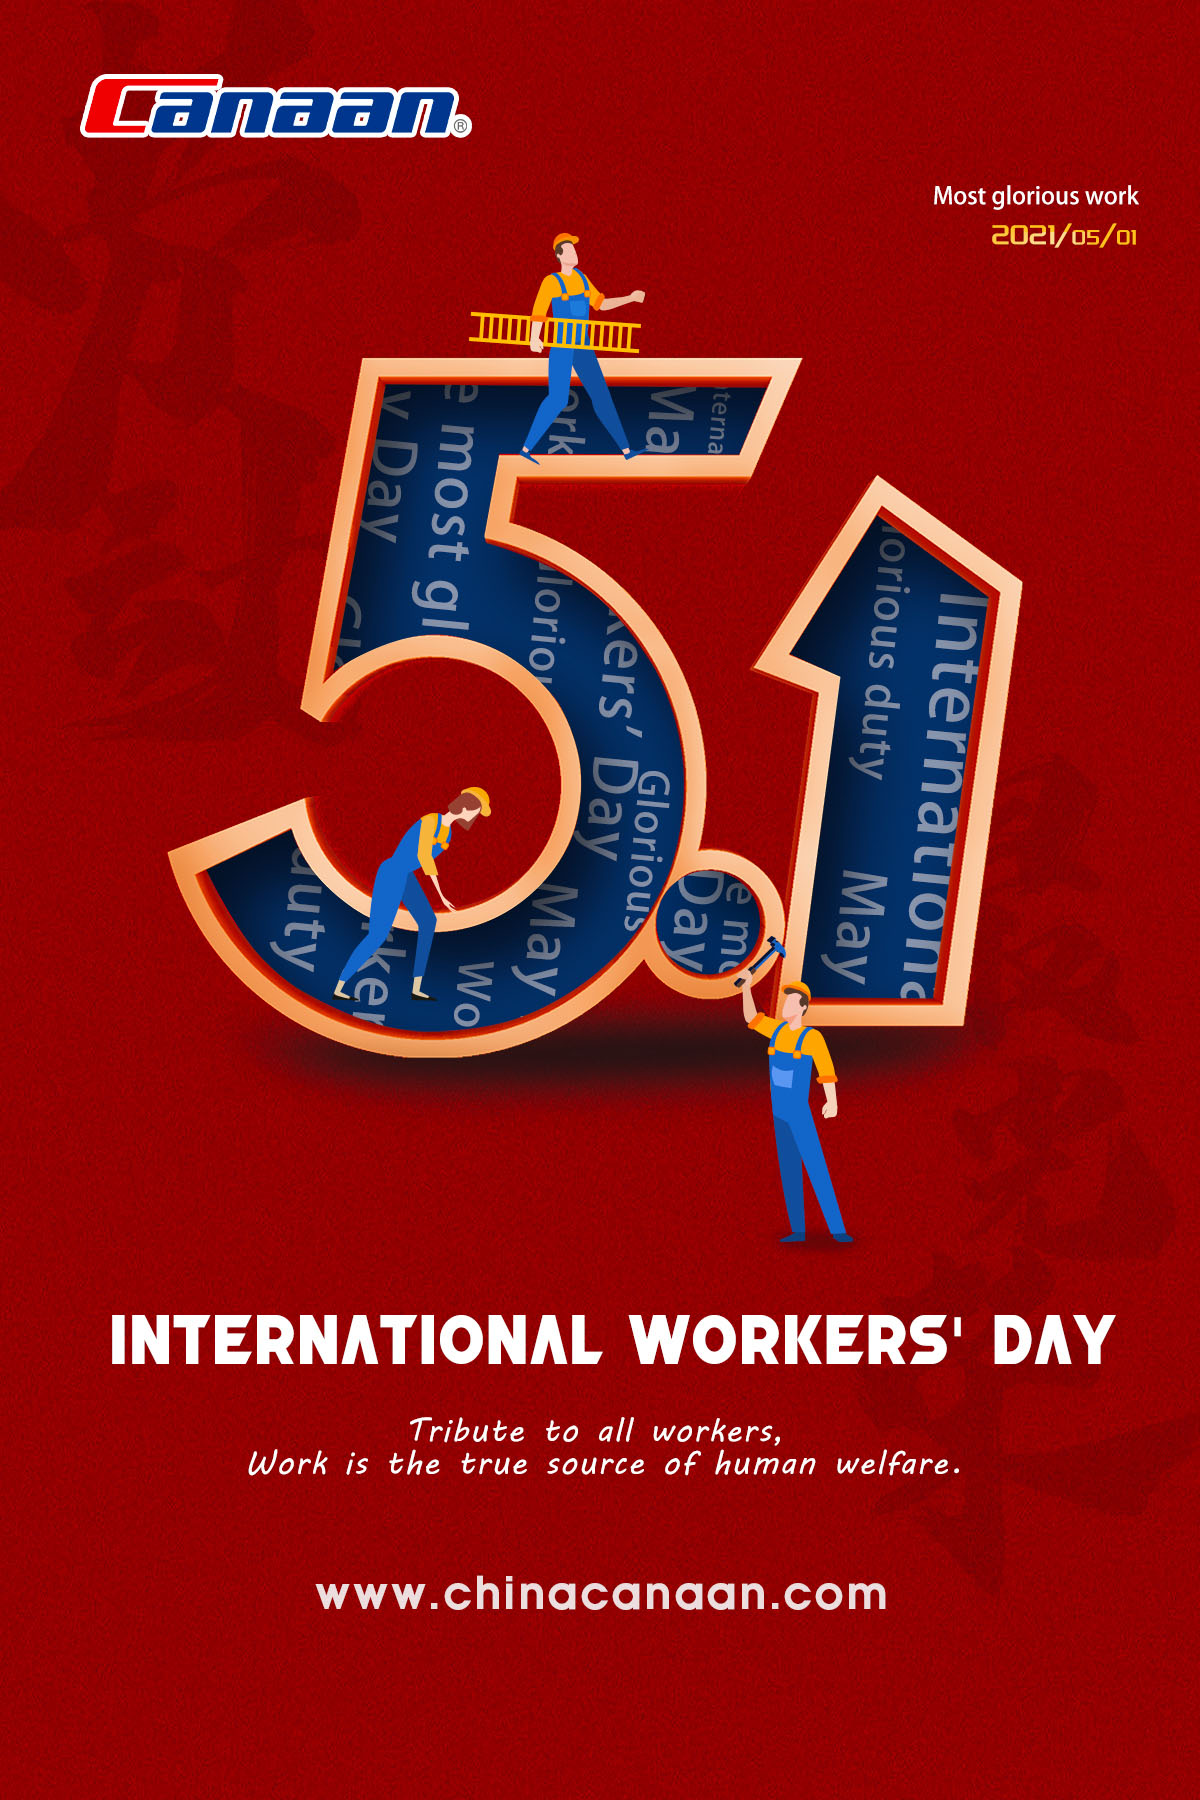 Happy International Worker's Day!